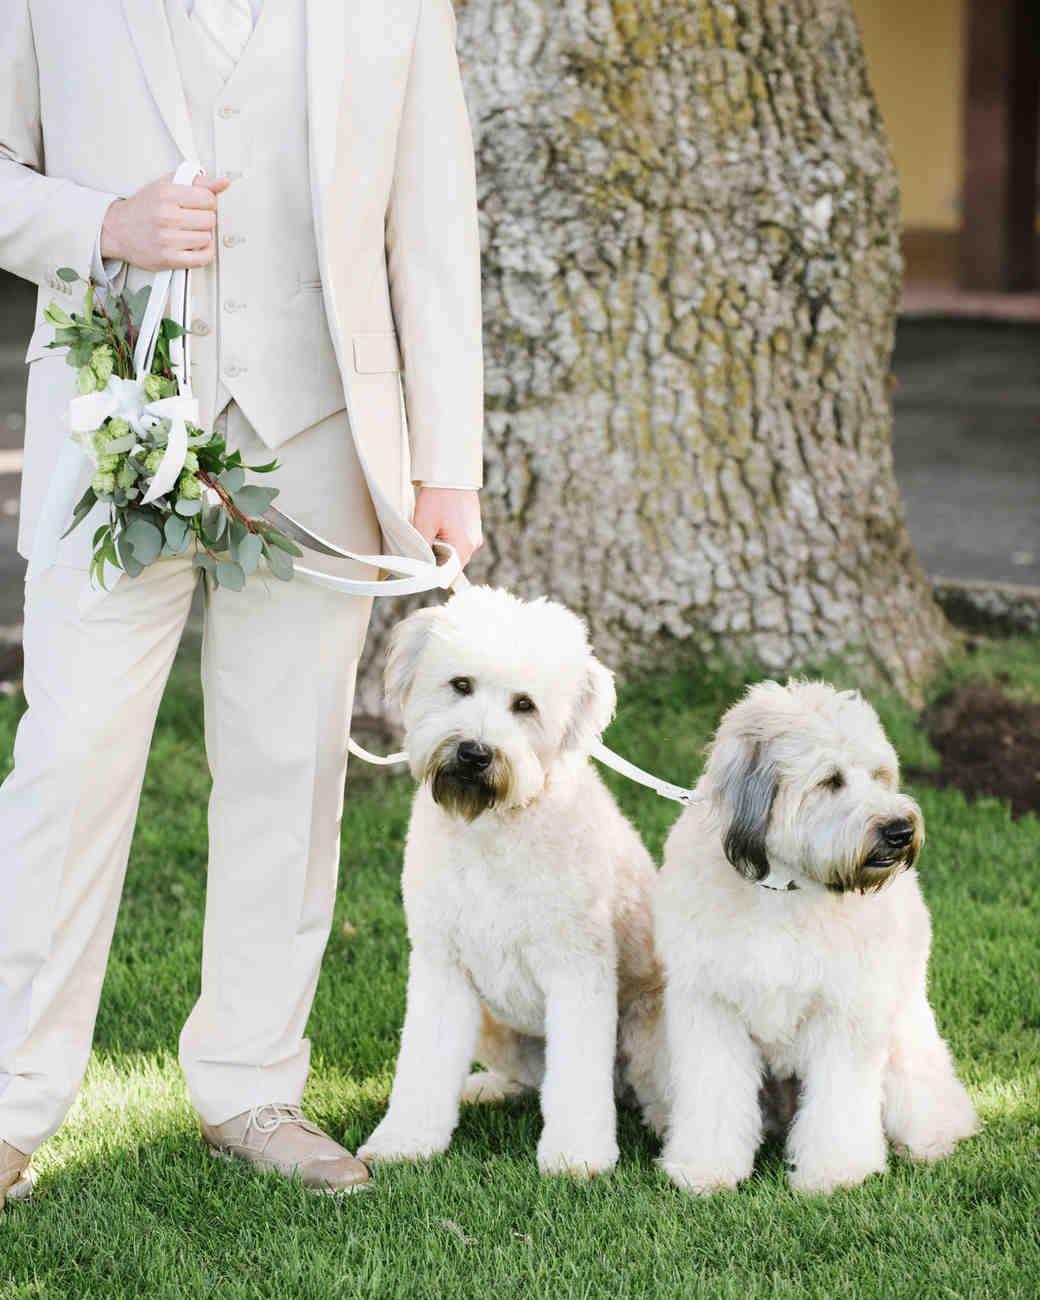 breelayne-hunter-wedding-california-0048-santa-lucia-preserve-fairy-woodsy-organic-dogs-s112849.jpg